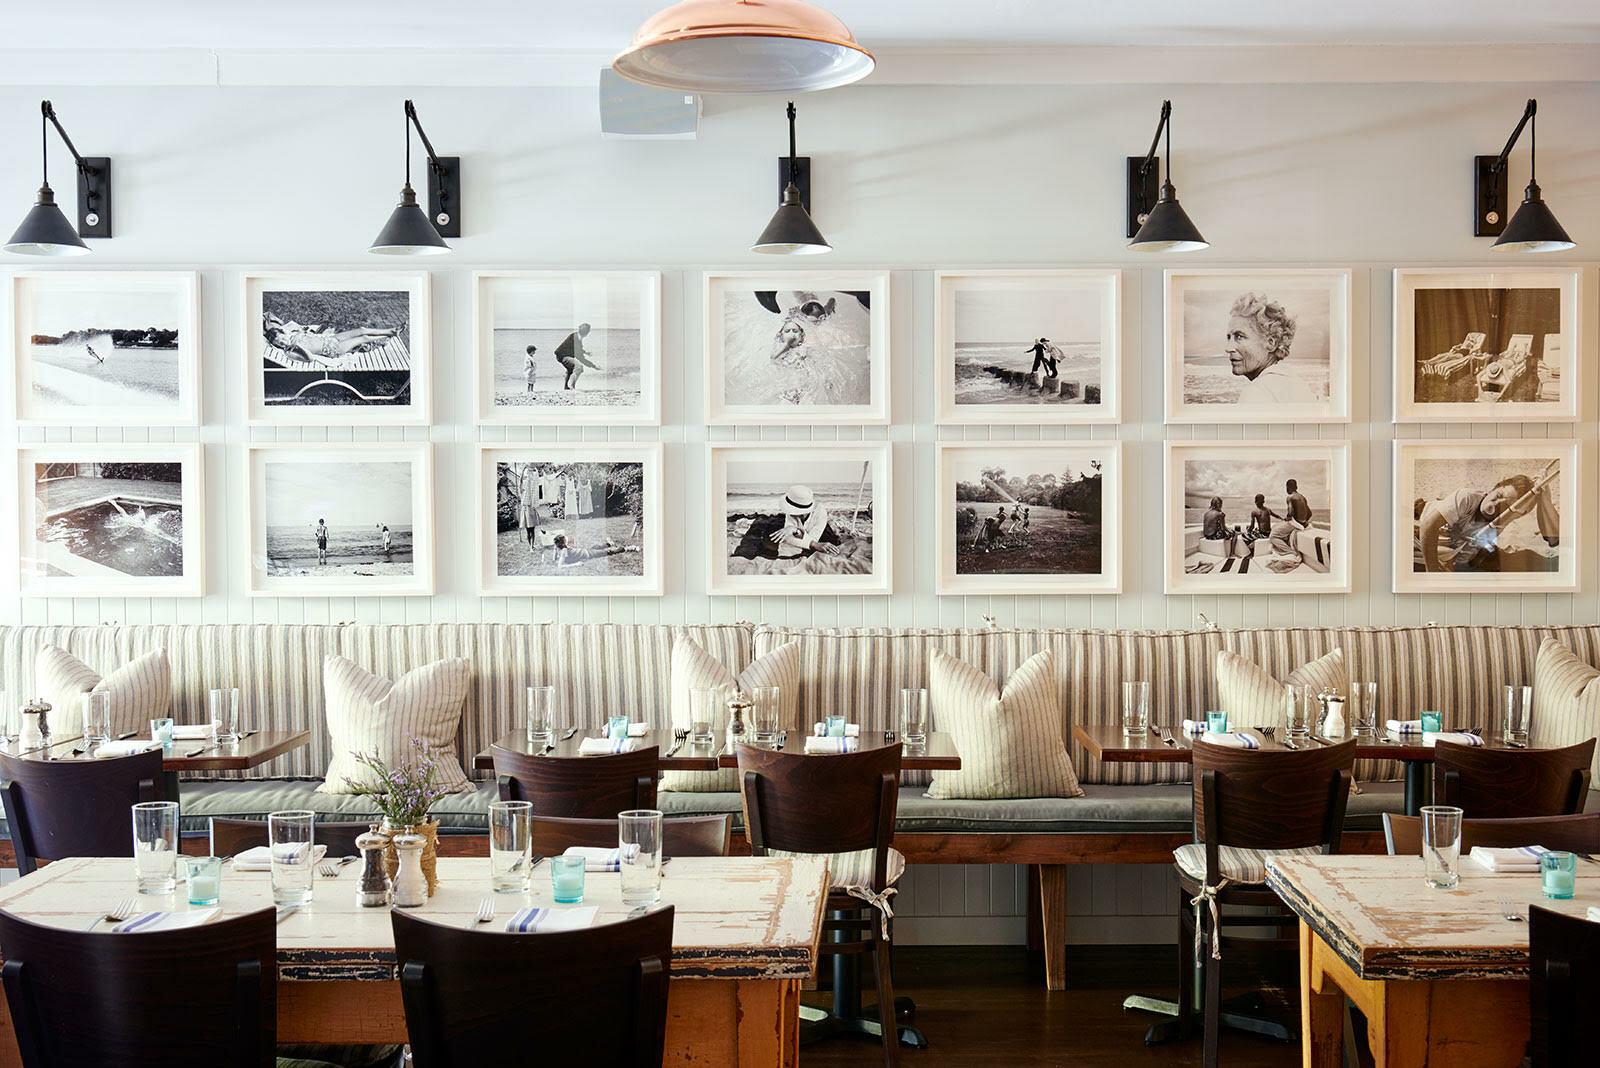 The interior of Highway Restaurant & Bar